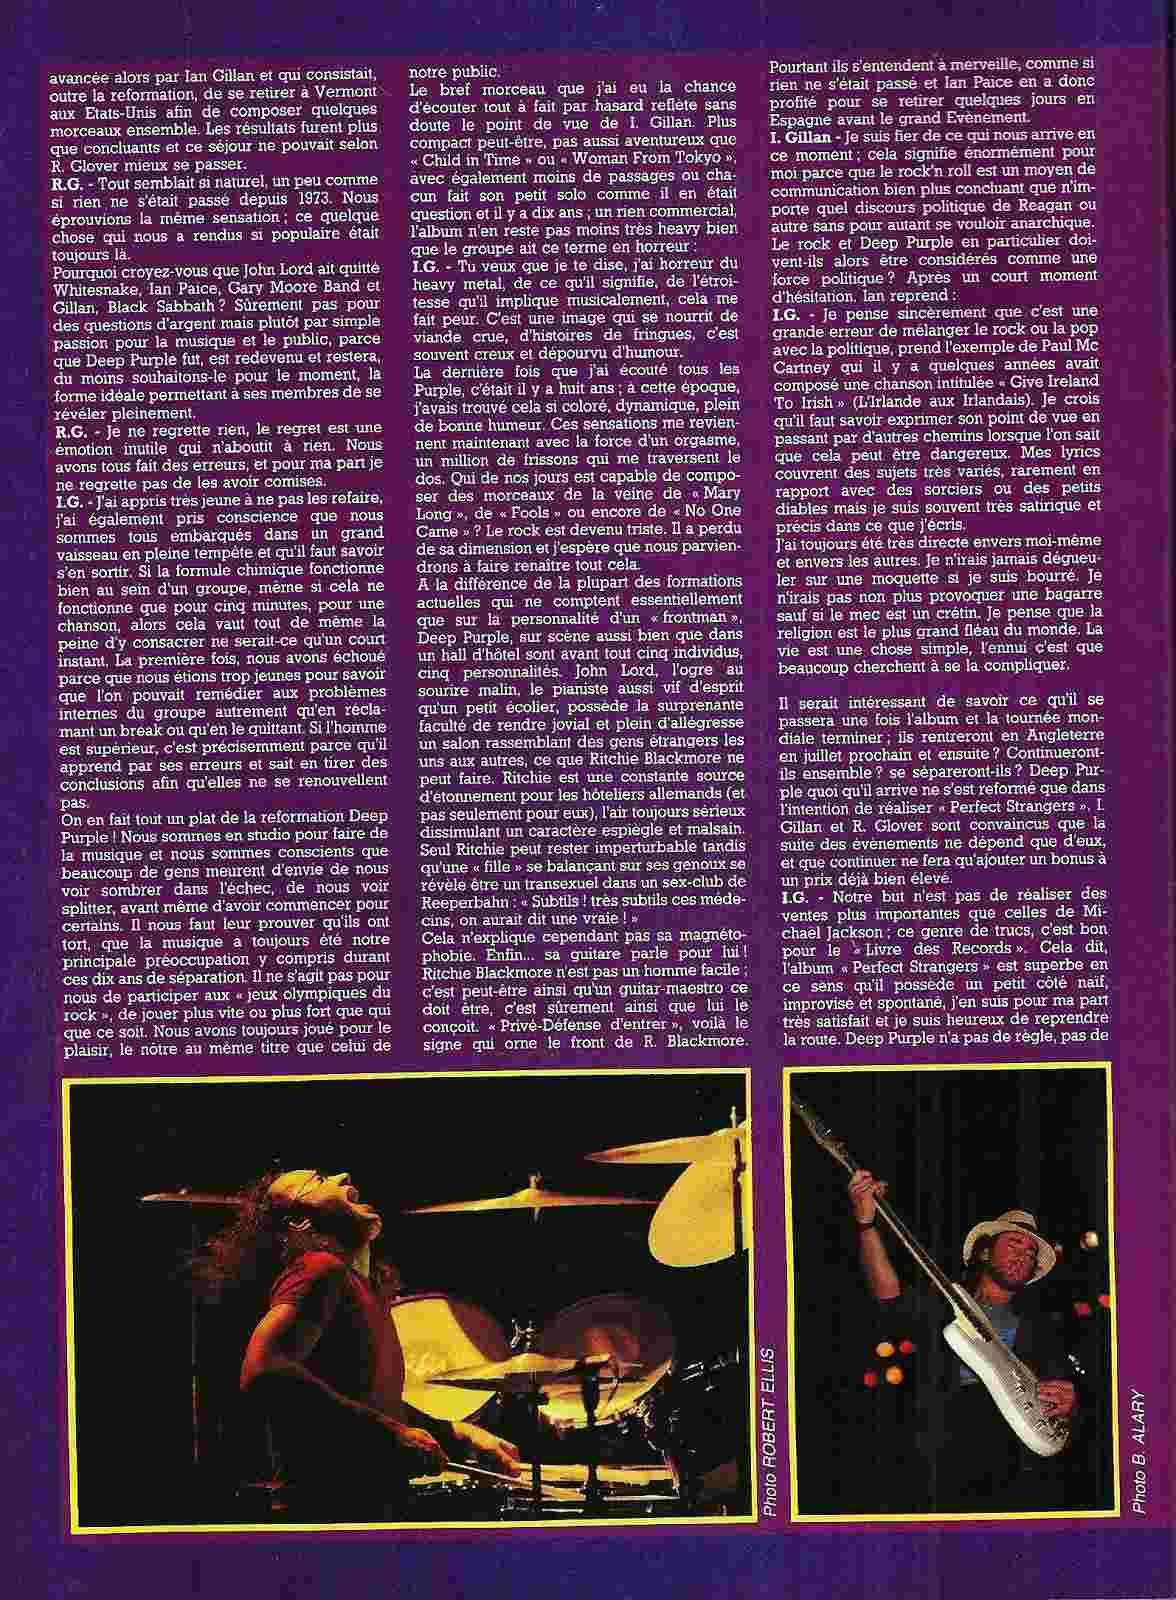 DEEP PURPLE : le dinosaure ressucité ! (Metal Attack Octobre 1984) Numyri26